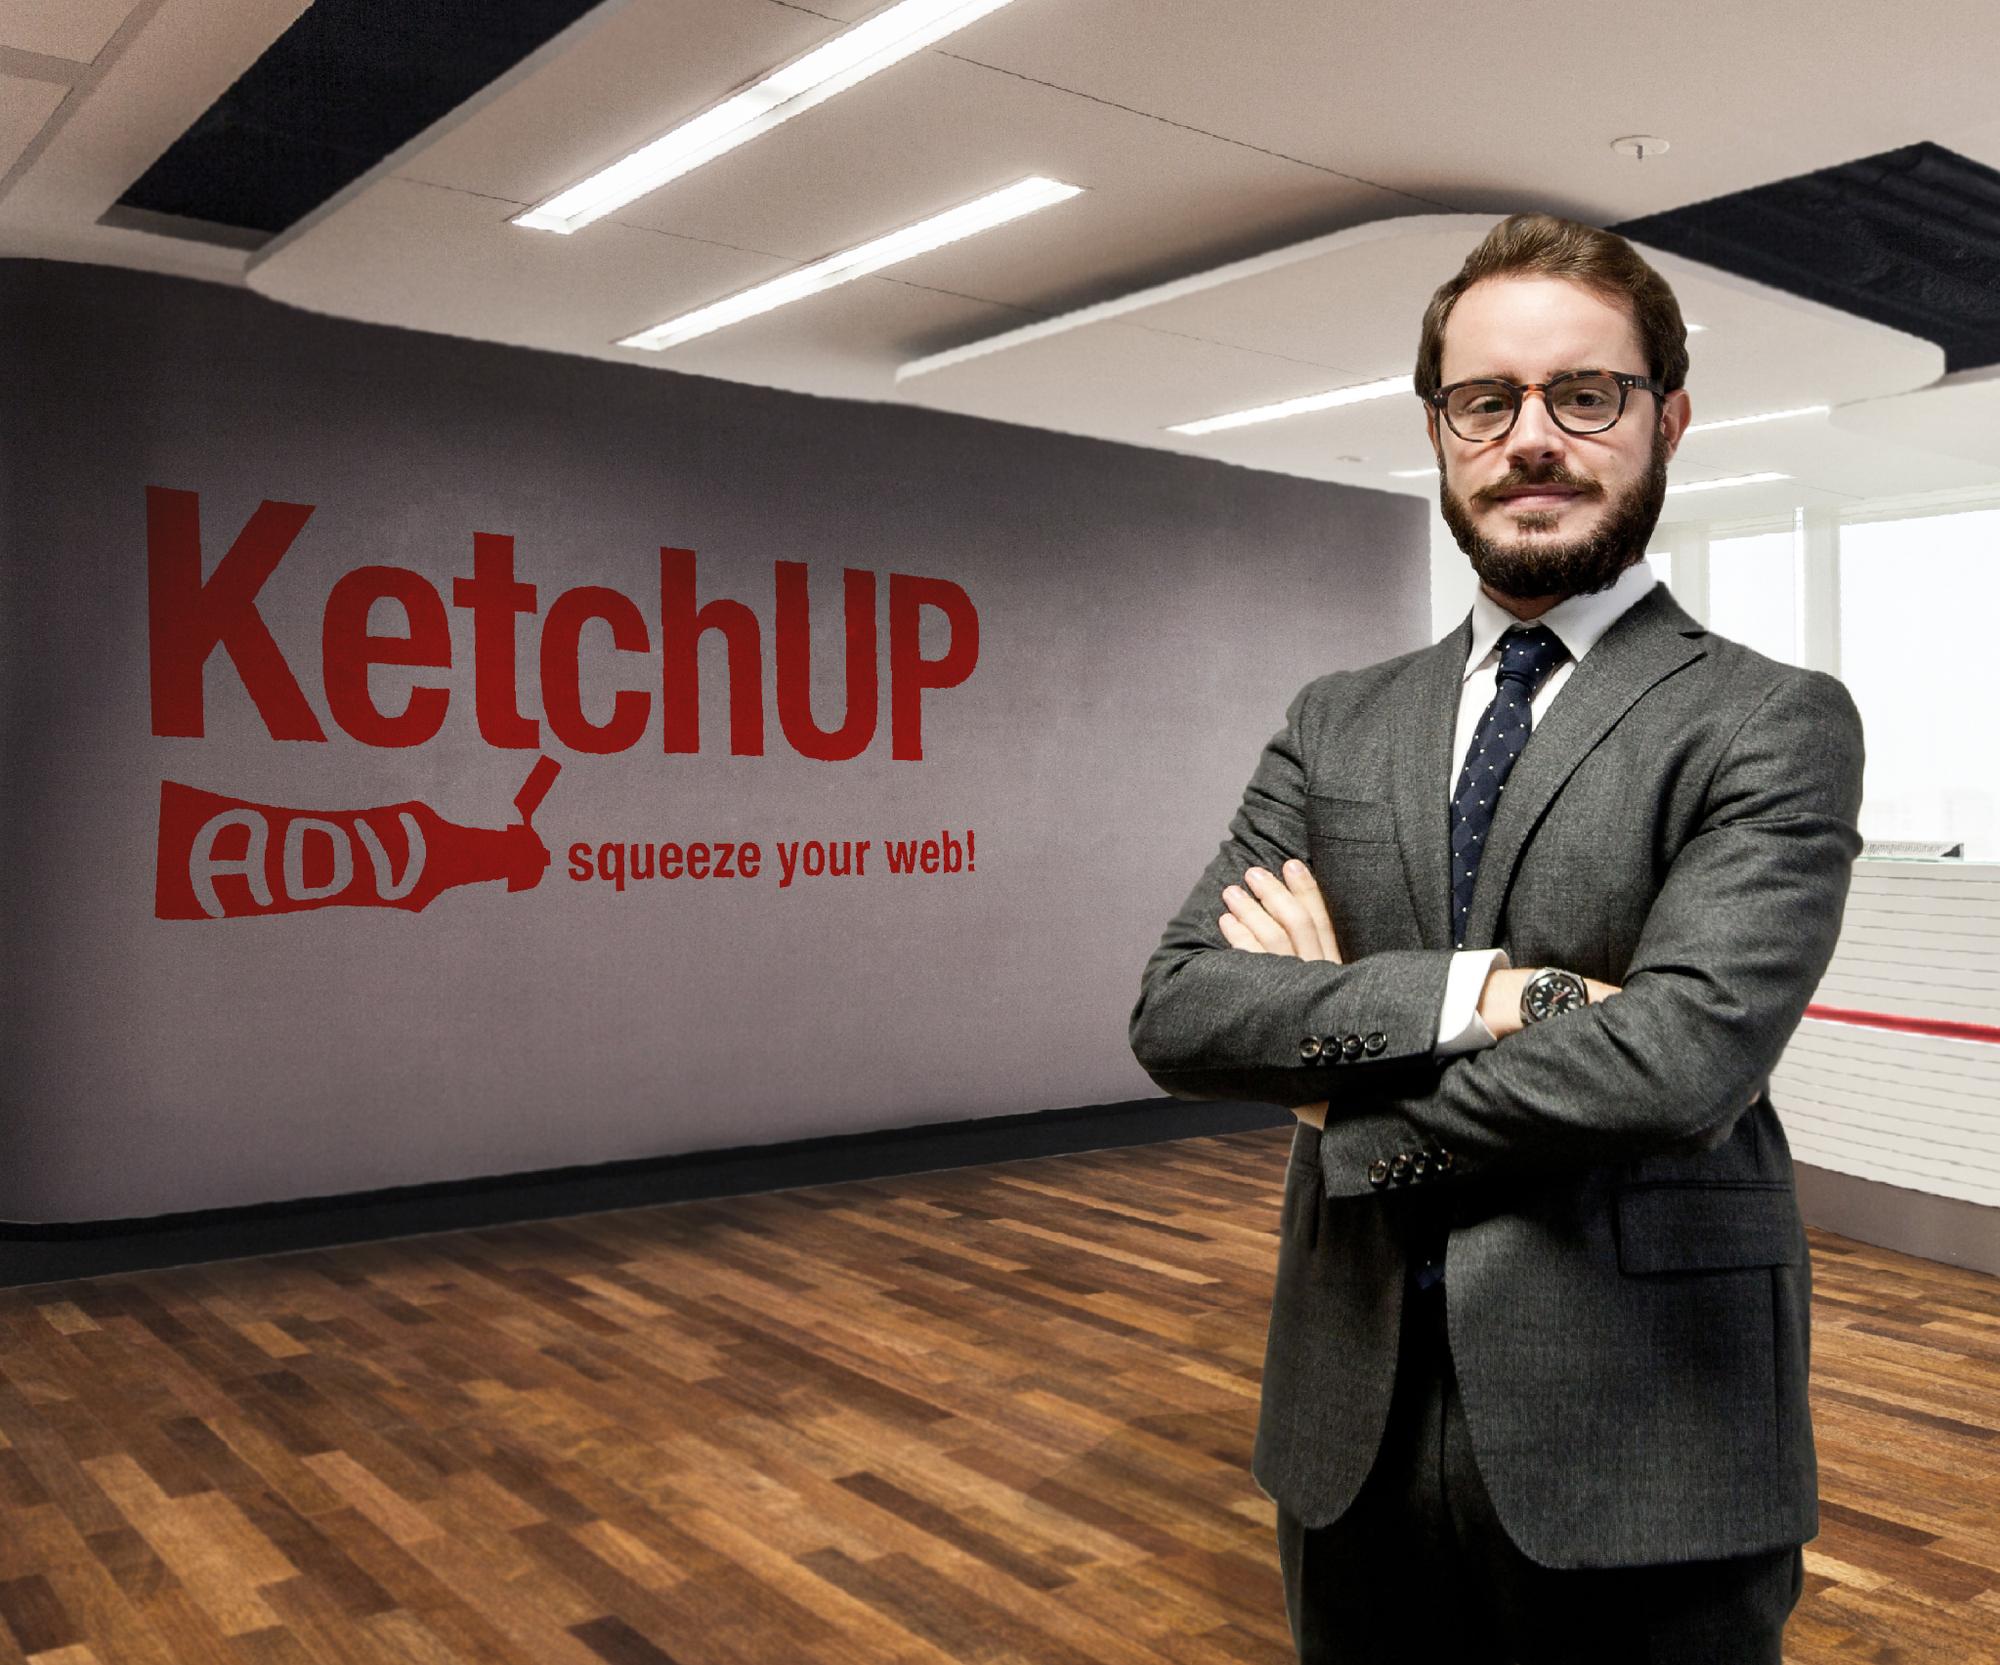 Email marketing: TempoDiSconti sceglie beMail di Ketchup Adv